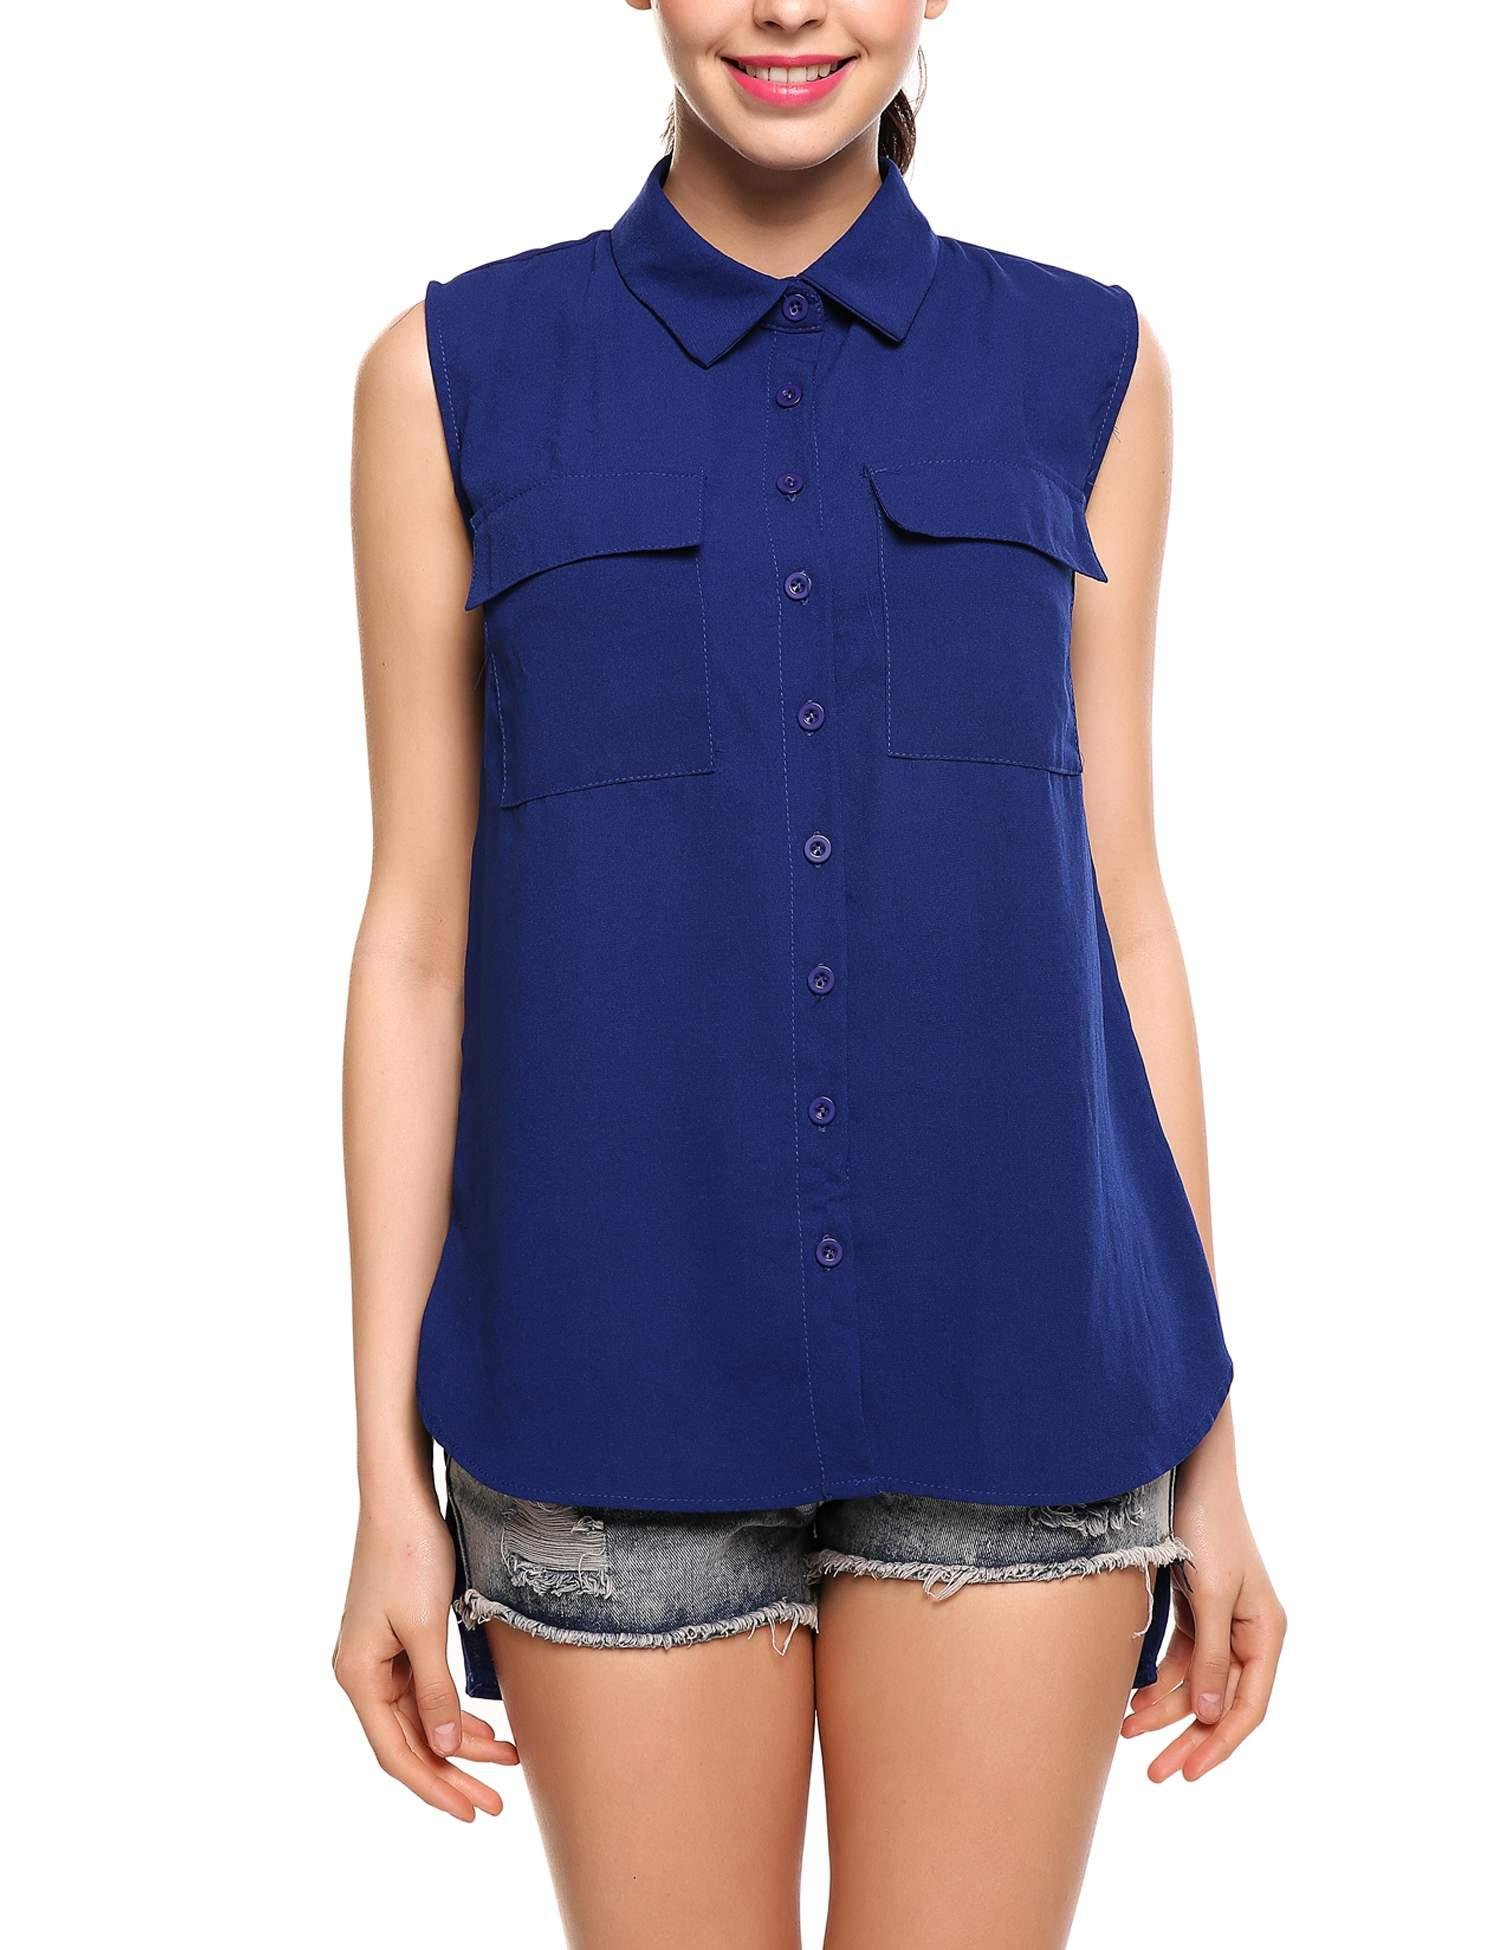 Jingjing1 Women's Summer V Neck Sleeveless Blouse Loose Pleated Chiffon Tank Tops (Large, Style 2- Blue)